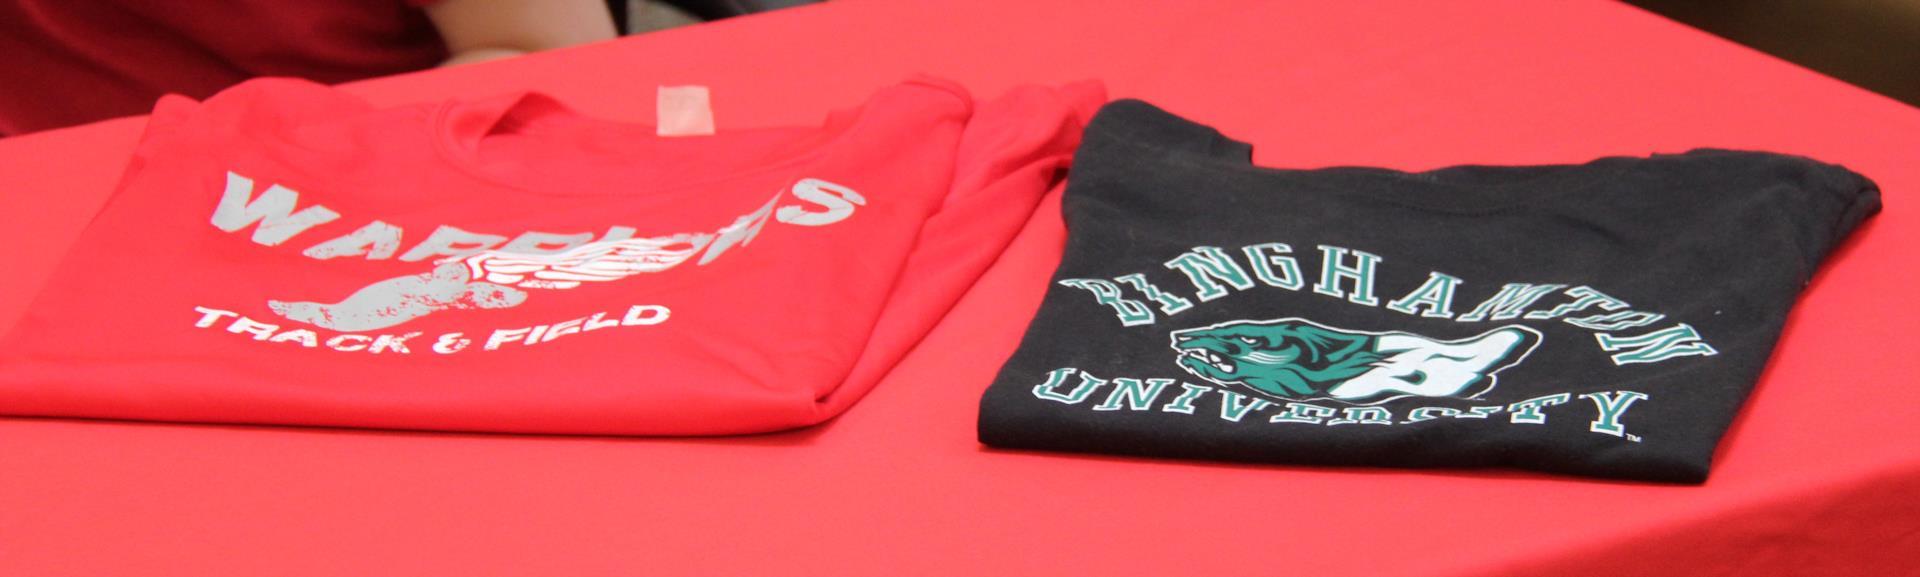 c v shirt and binghamton university shirt